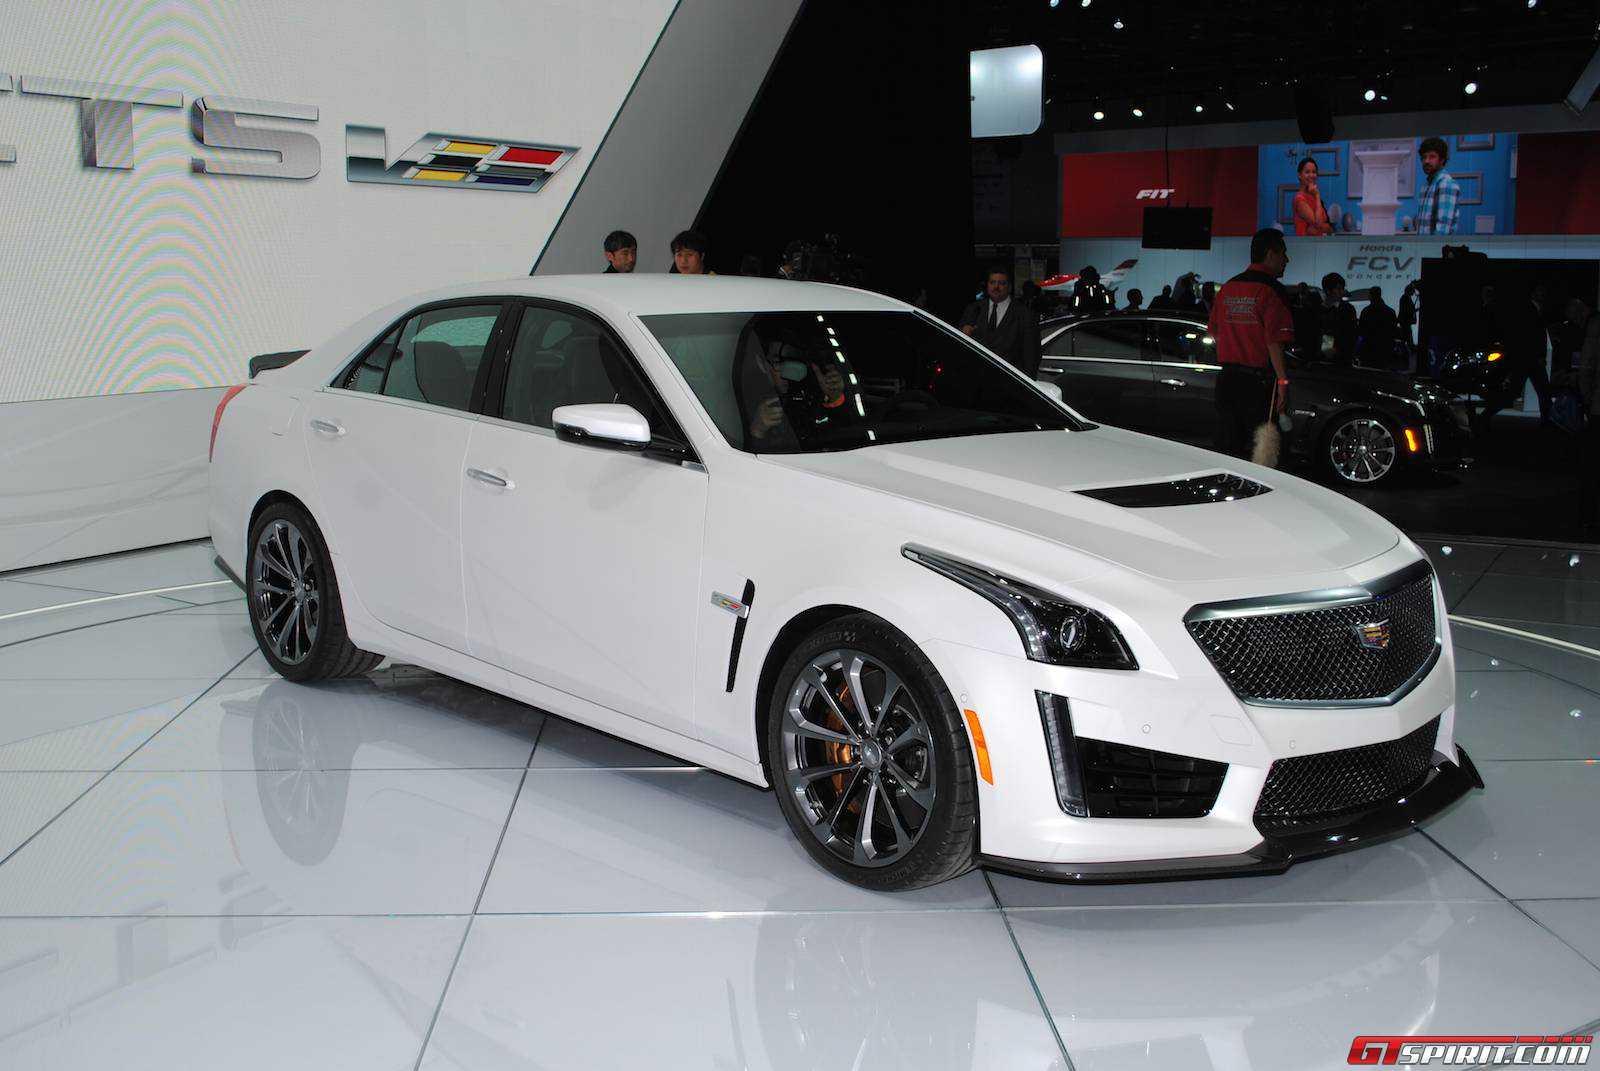 Detroit 2015: Cadillac CTS-V - GTspirit